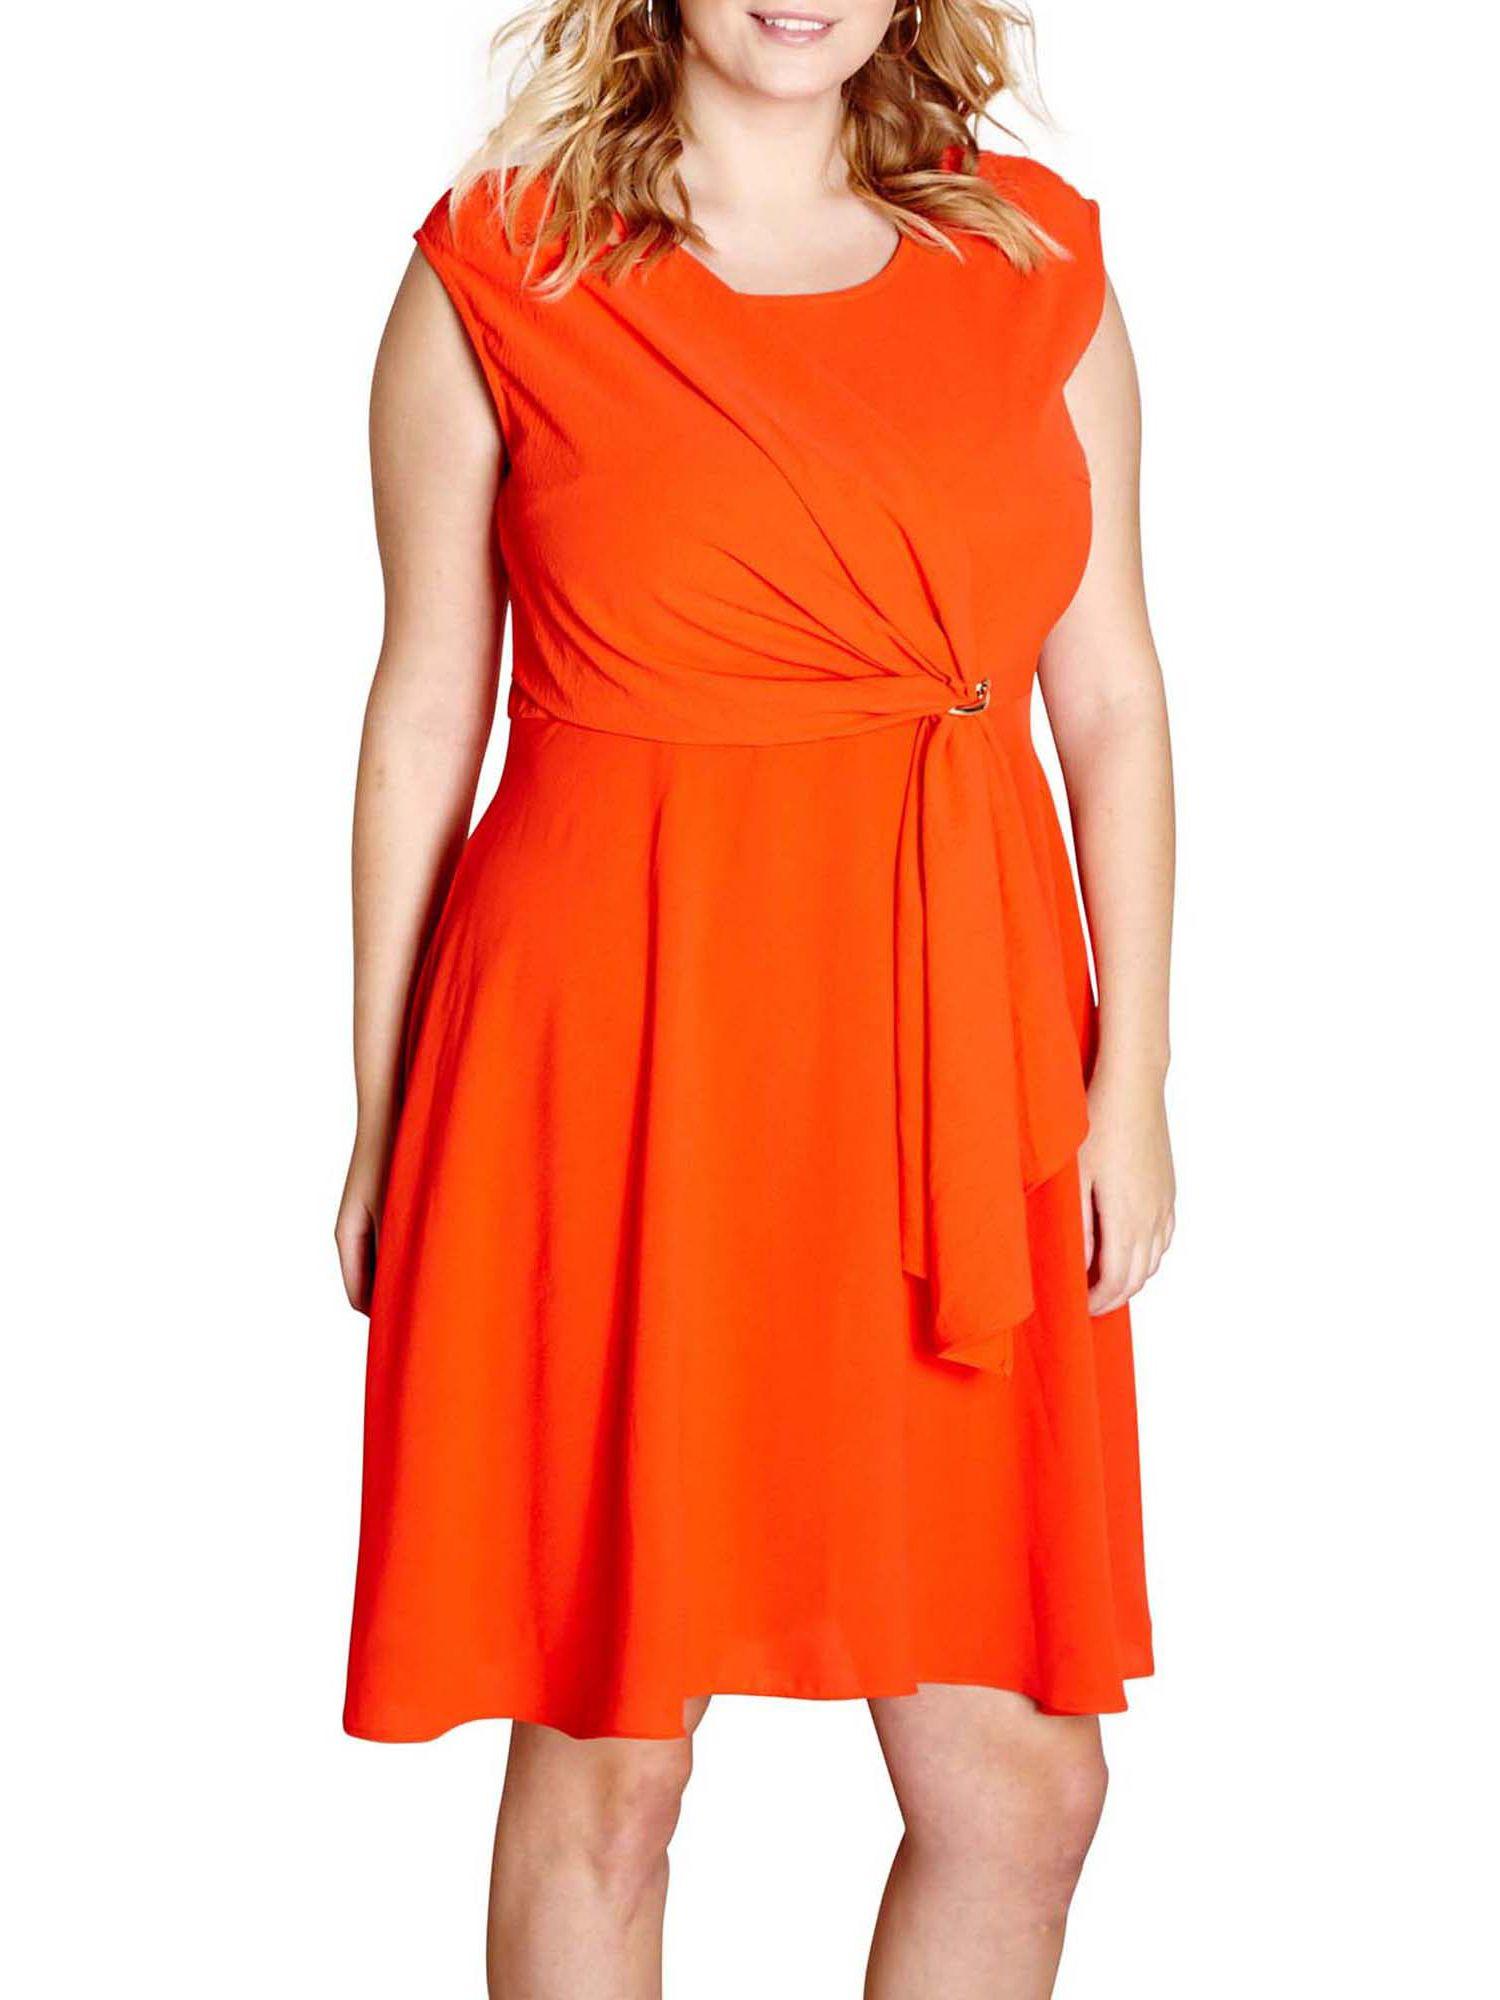 Yumi Curves Yumi Curves Drape Eyelet Dress, Red